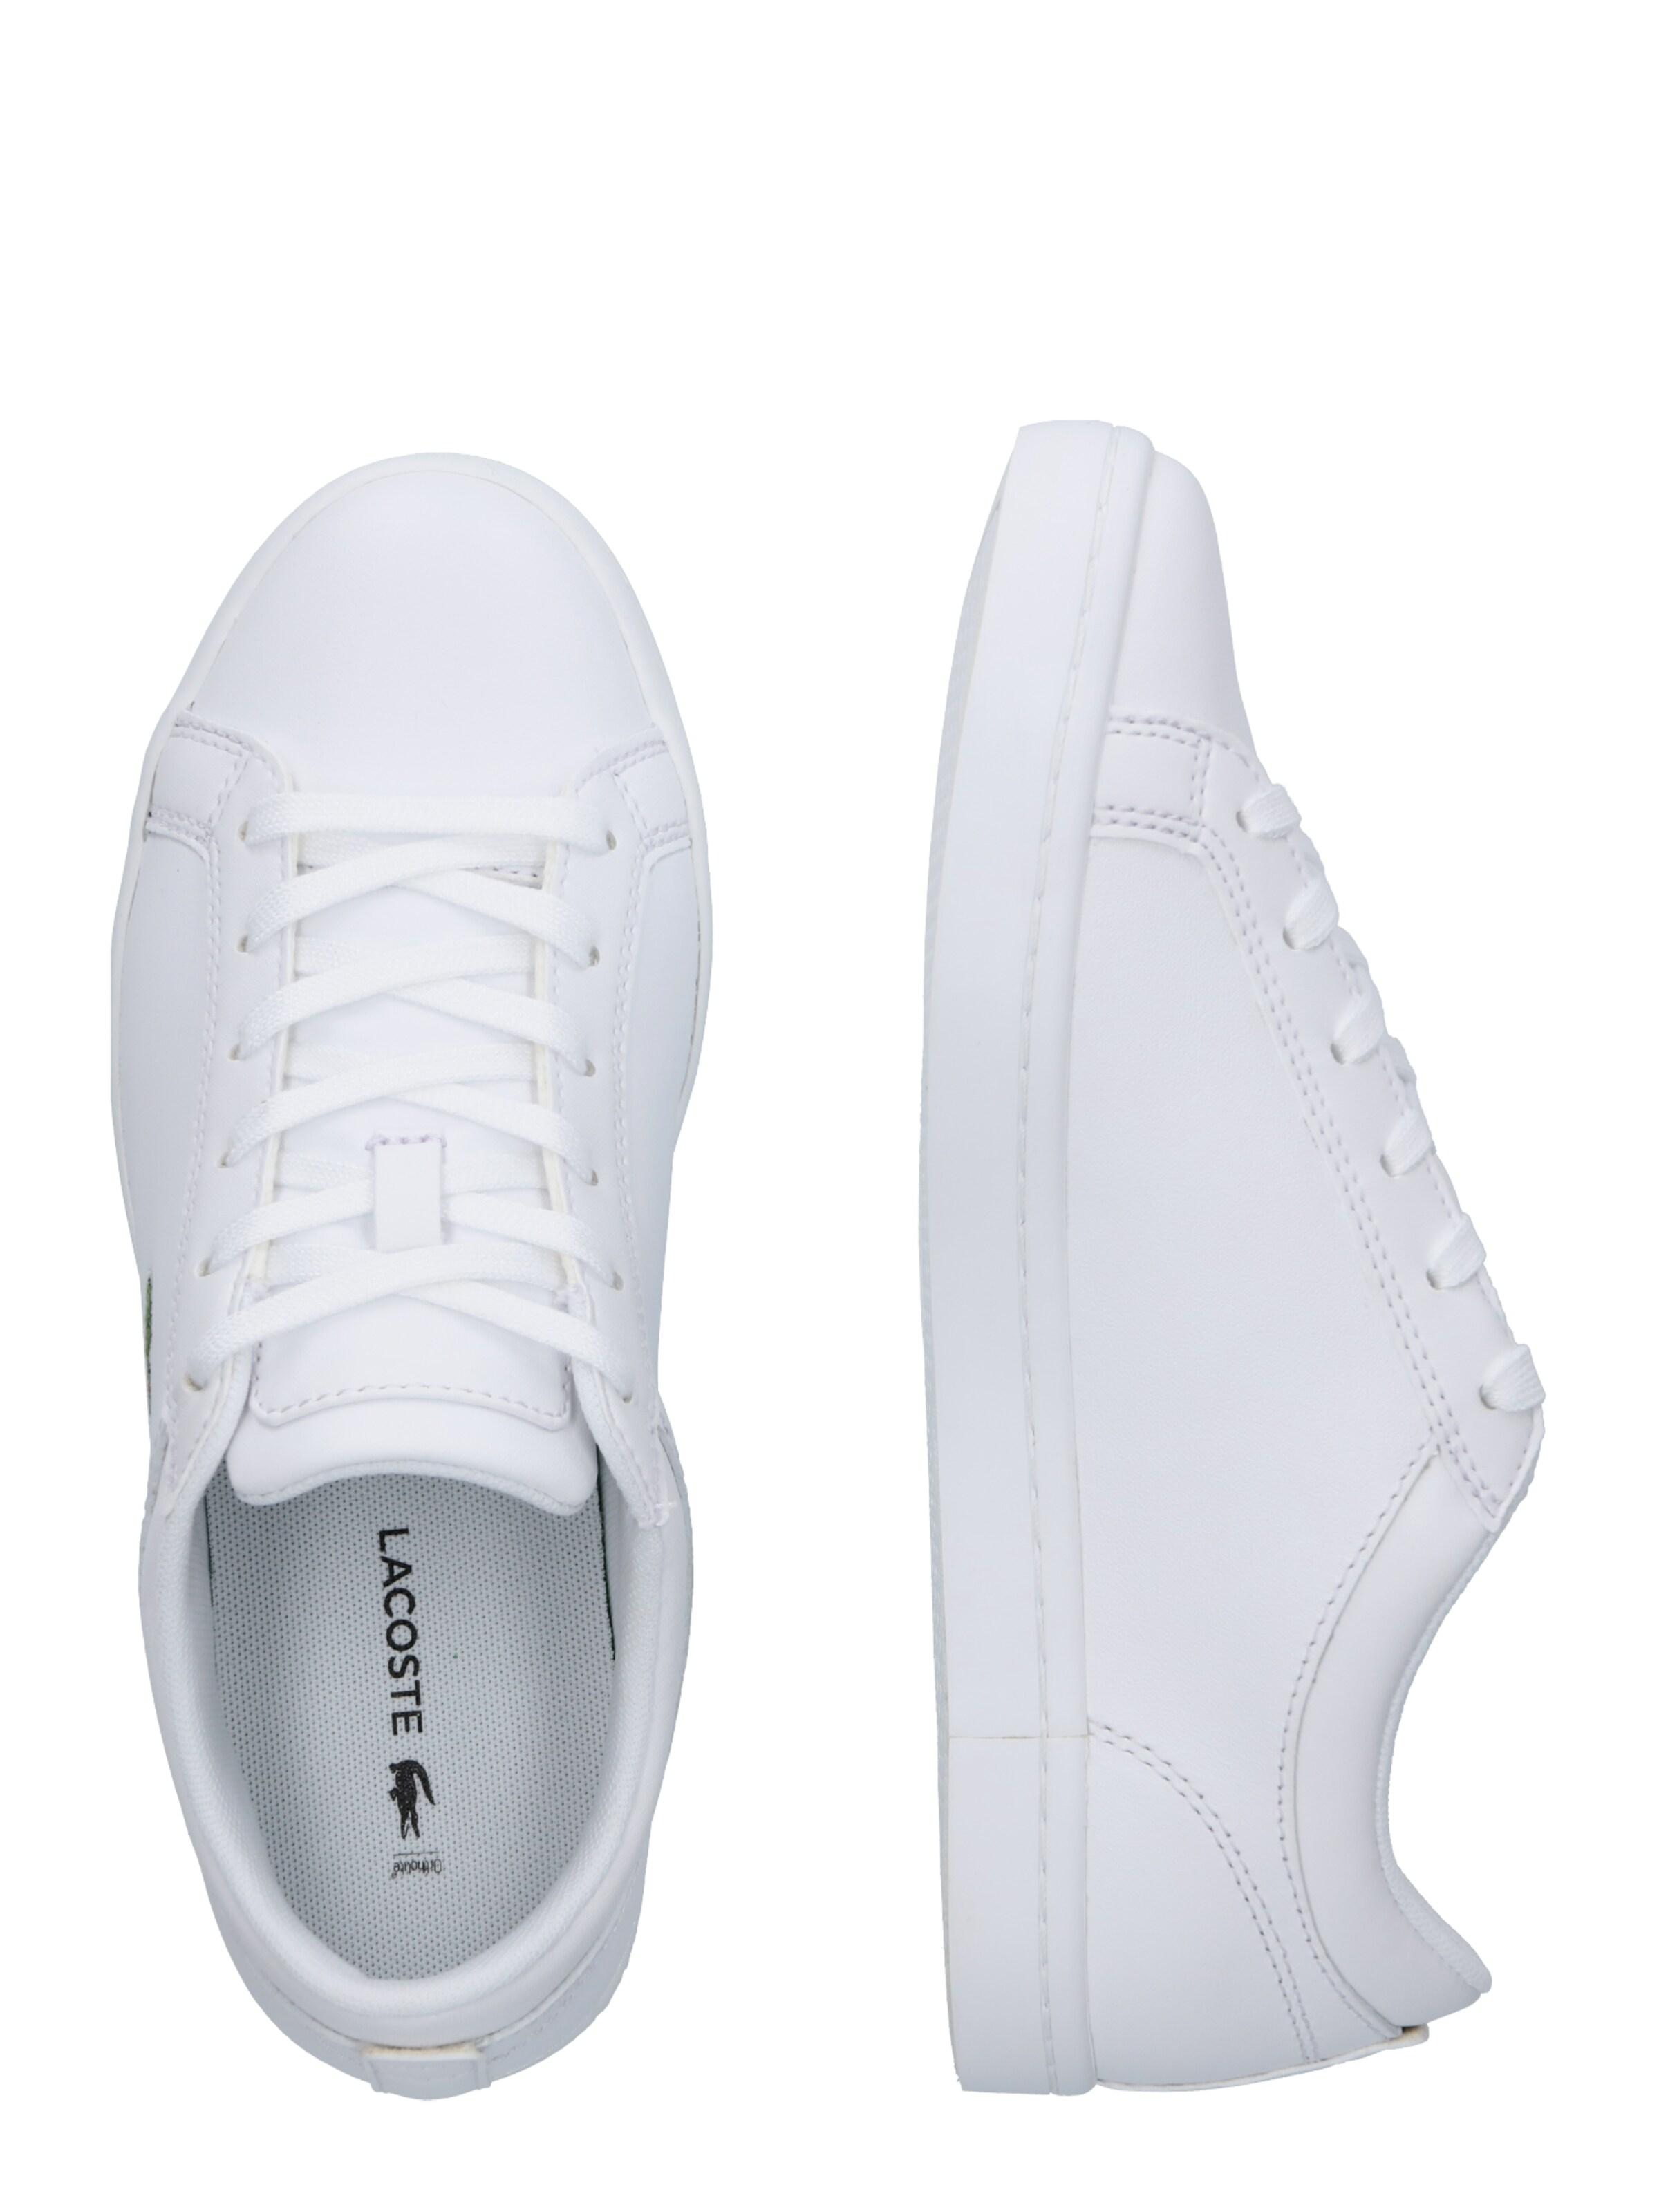 Weiß 'straightset 1 Bl Sneaker In Cfa' Lacoste ymfYb6v7Ig